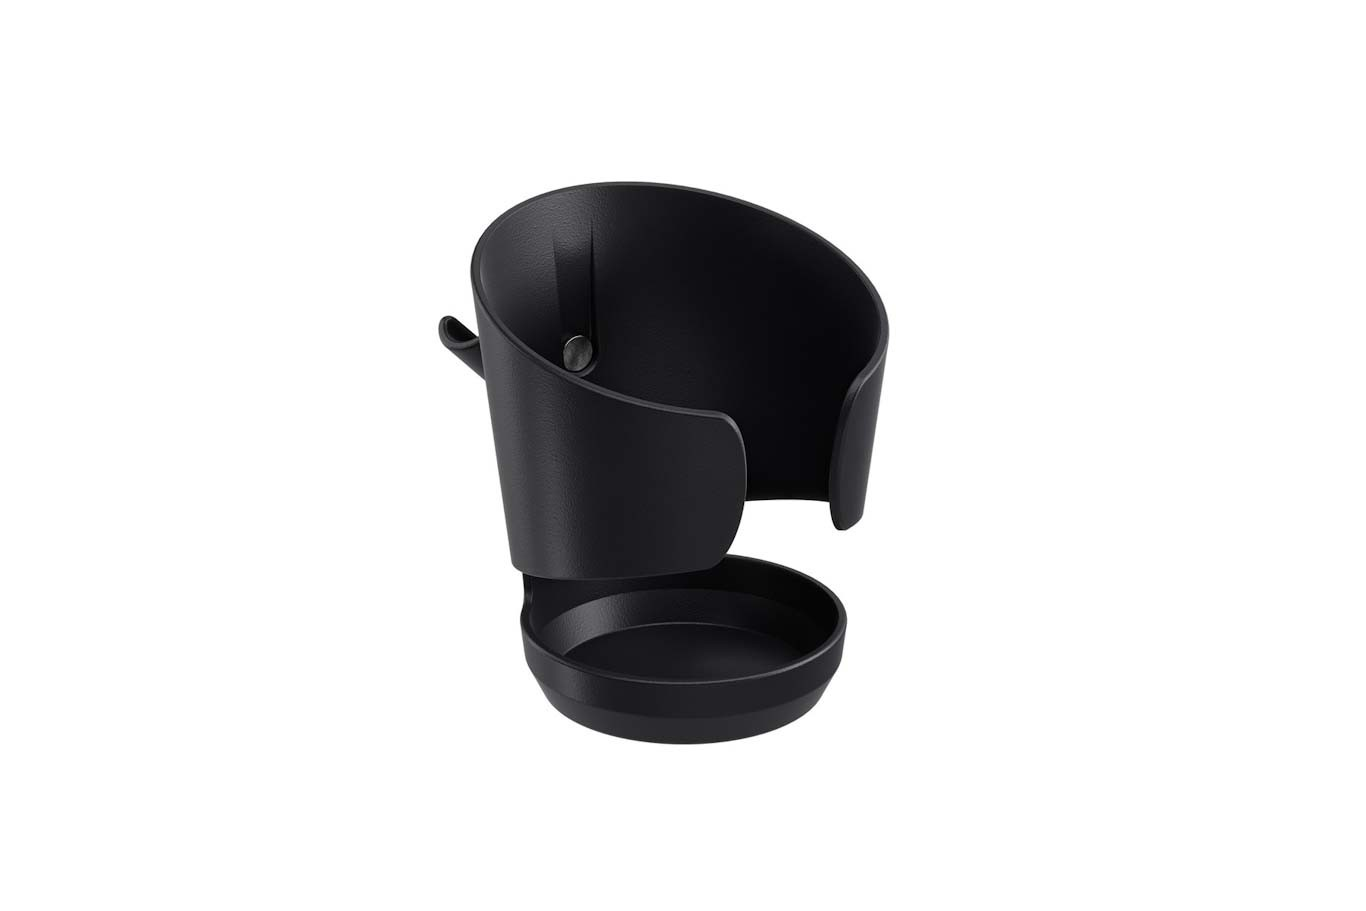 PORTA COPOS PARA SLEEK CUP HOLDER - BLACK  - THULE